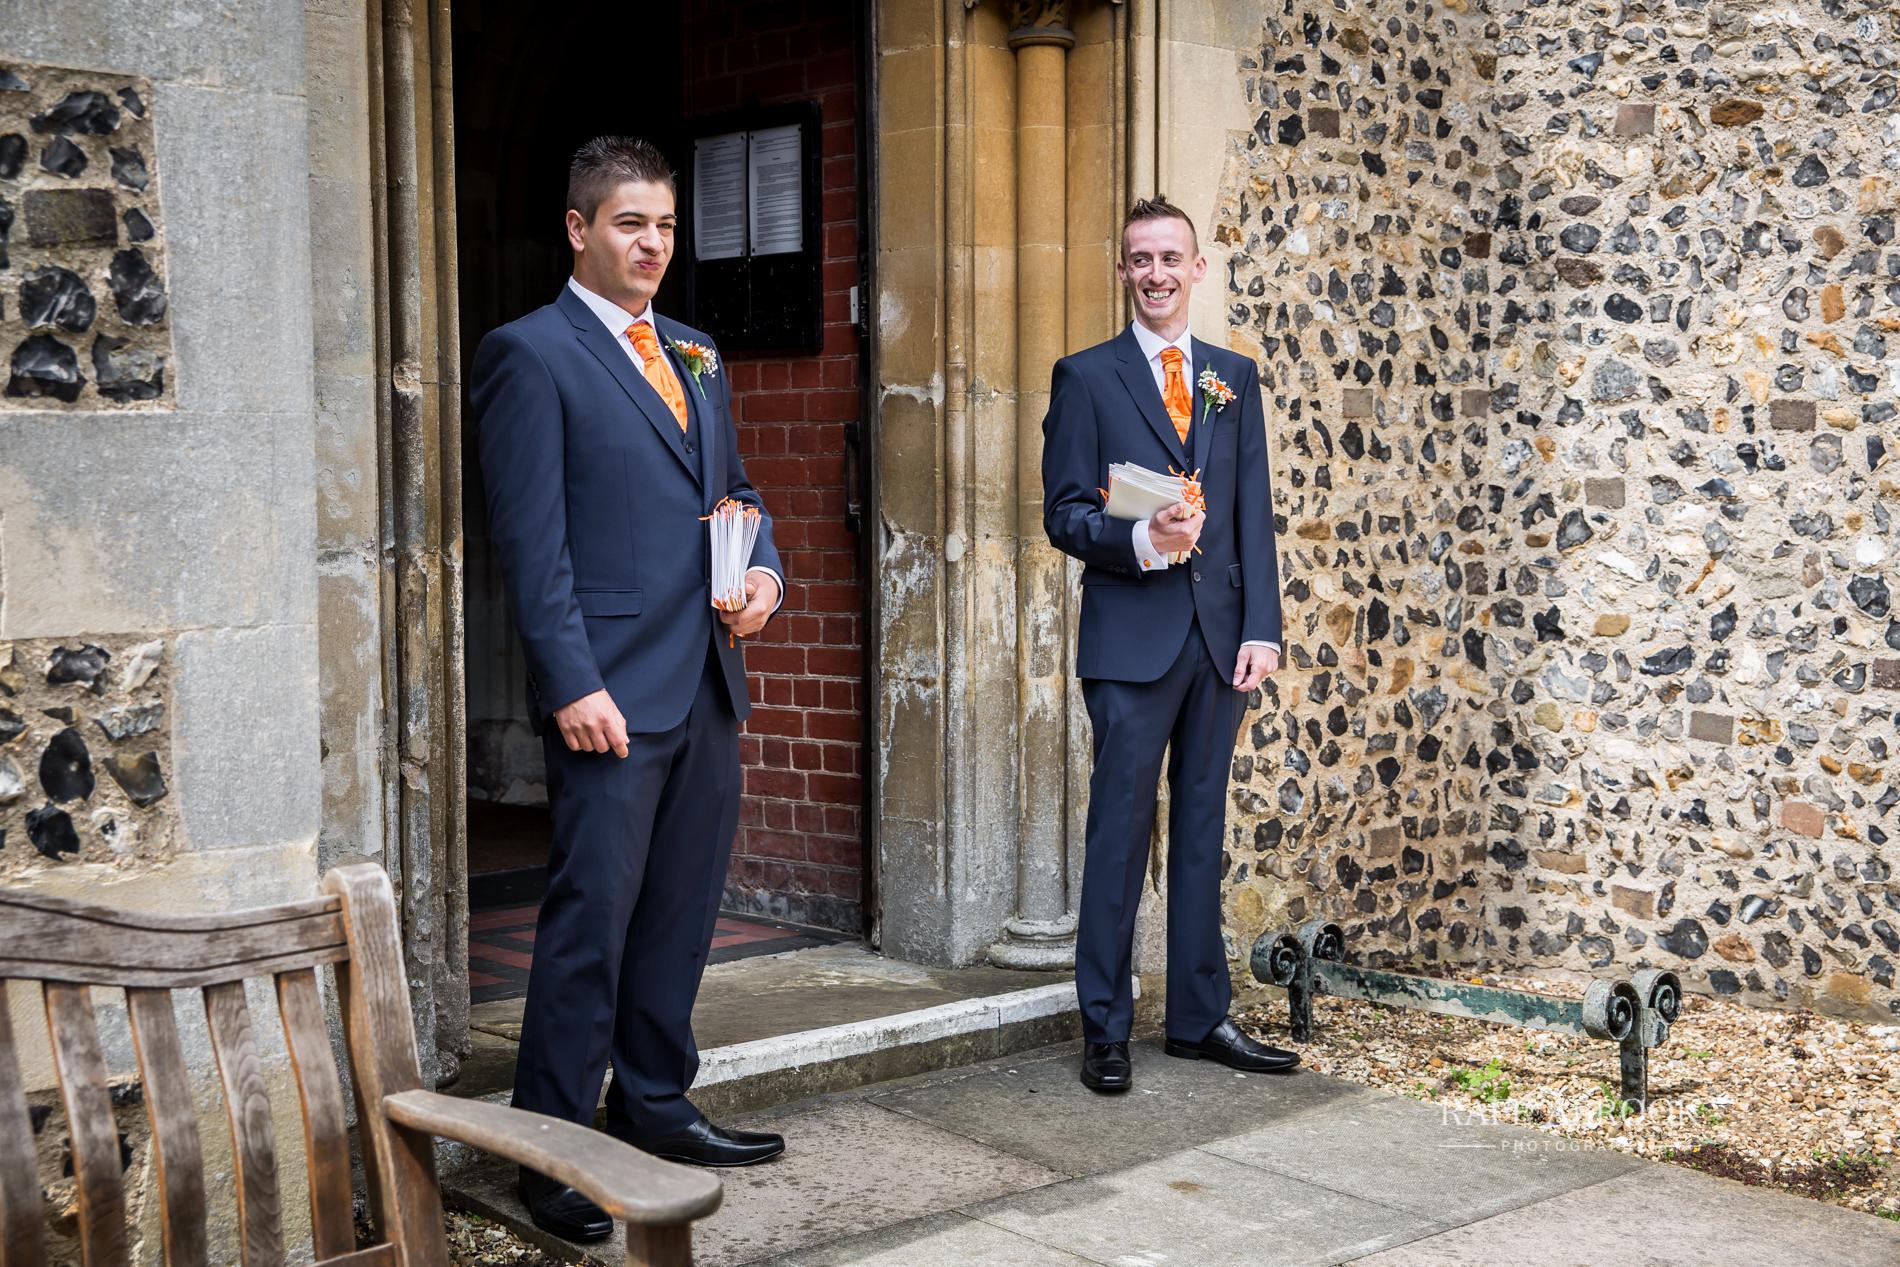 miriam & craig the dower house hexton hertfordshire wedding photographer-1112.jpg